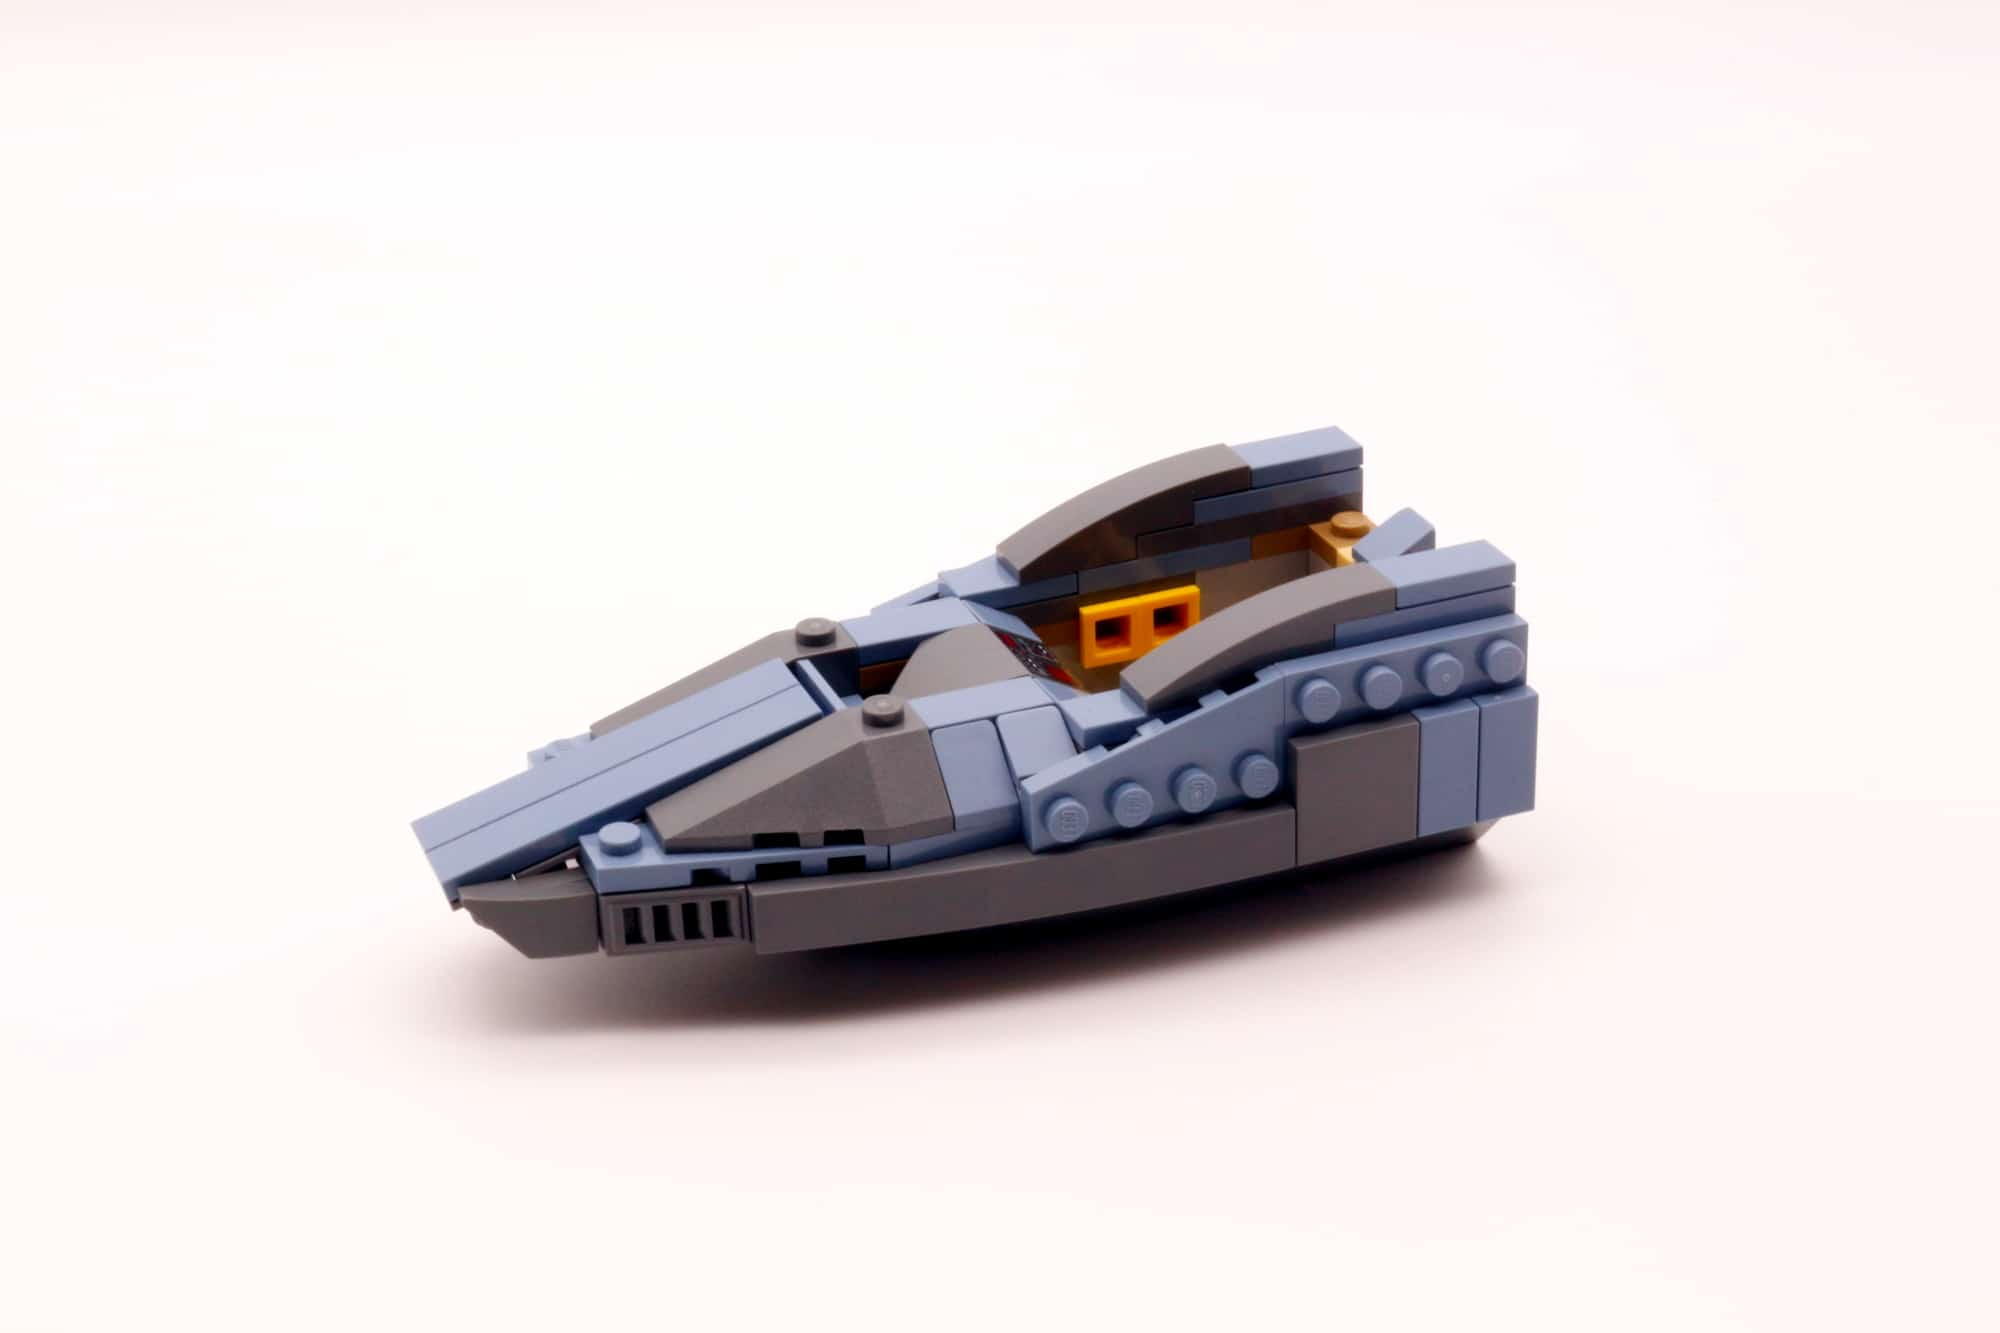 LEGO Star Wars 75314 The Bad Batch Attack Shuttle 4